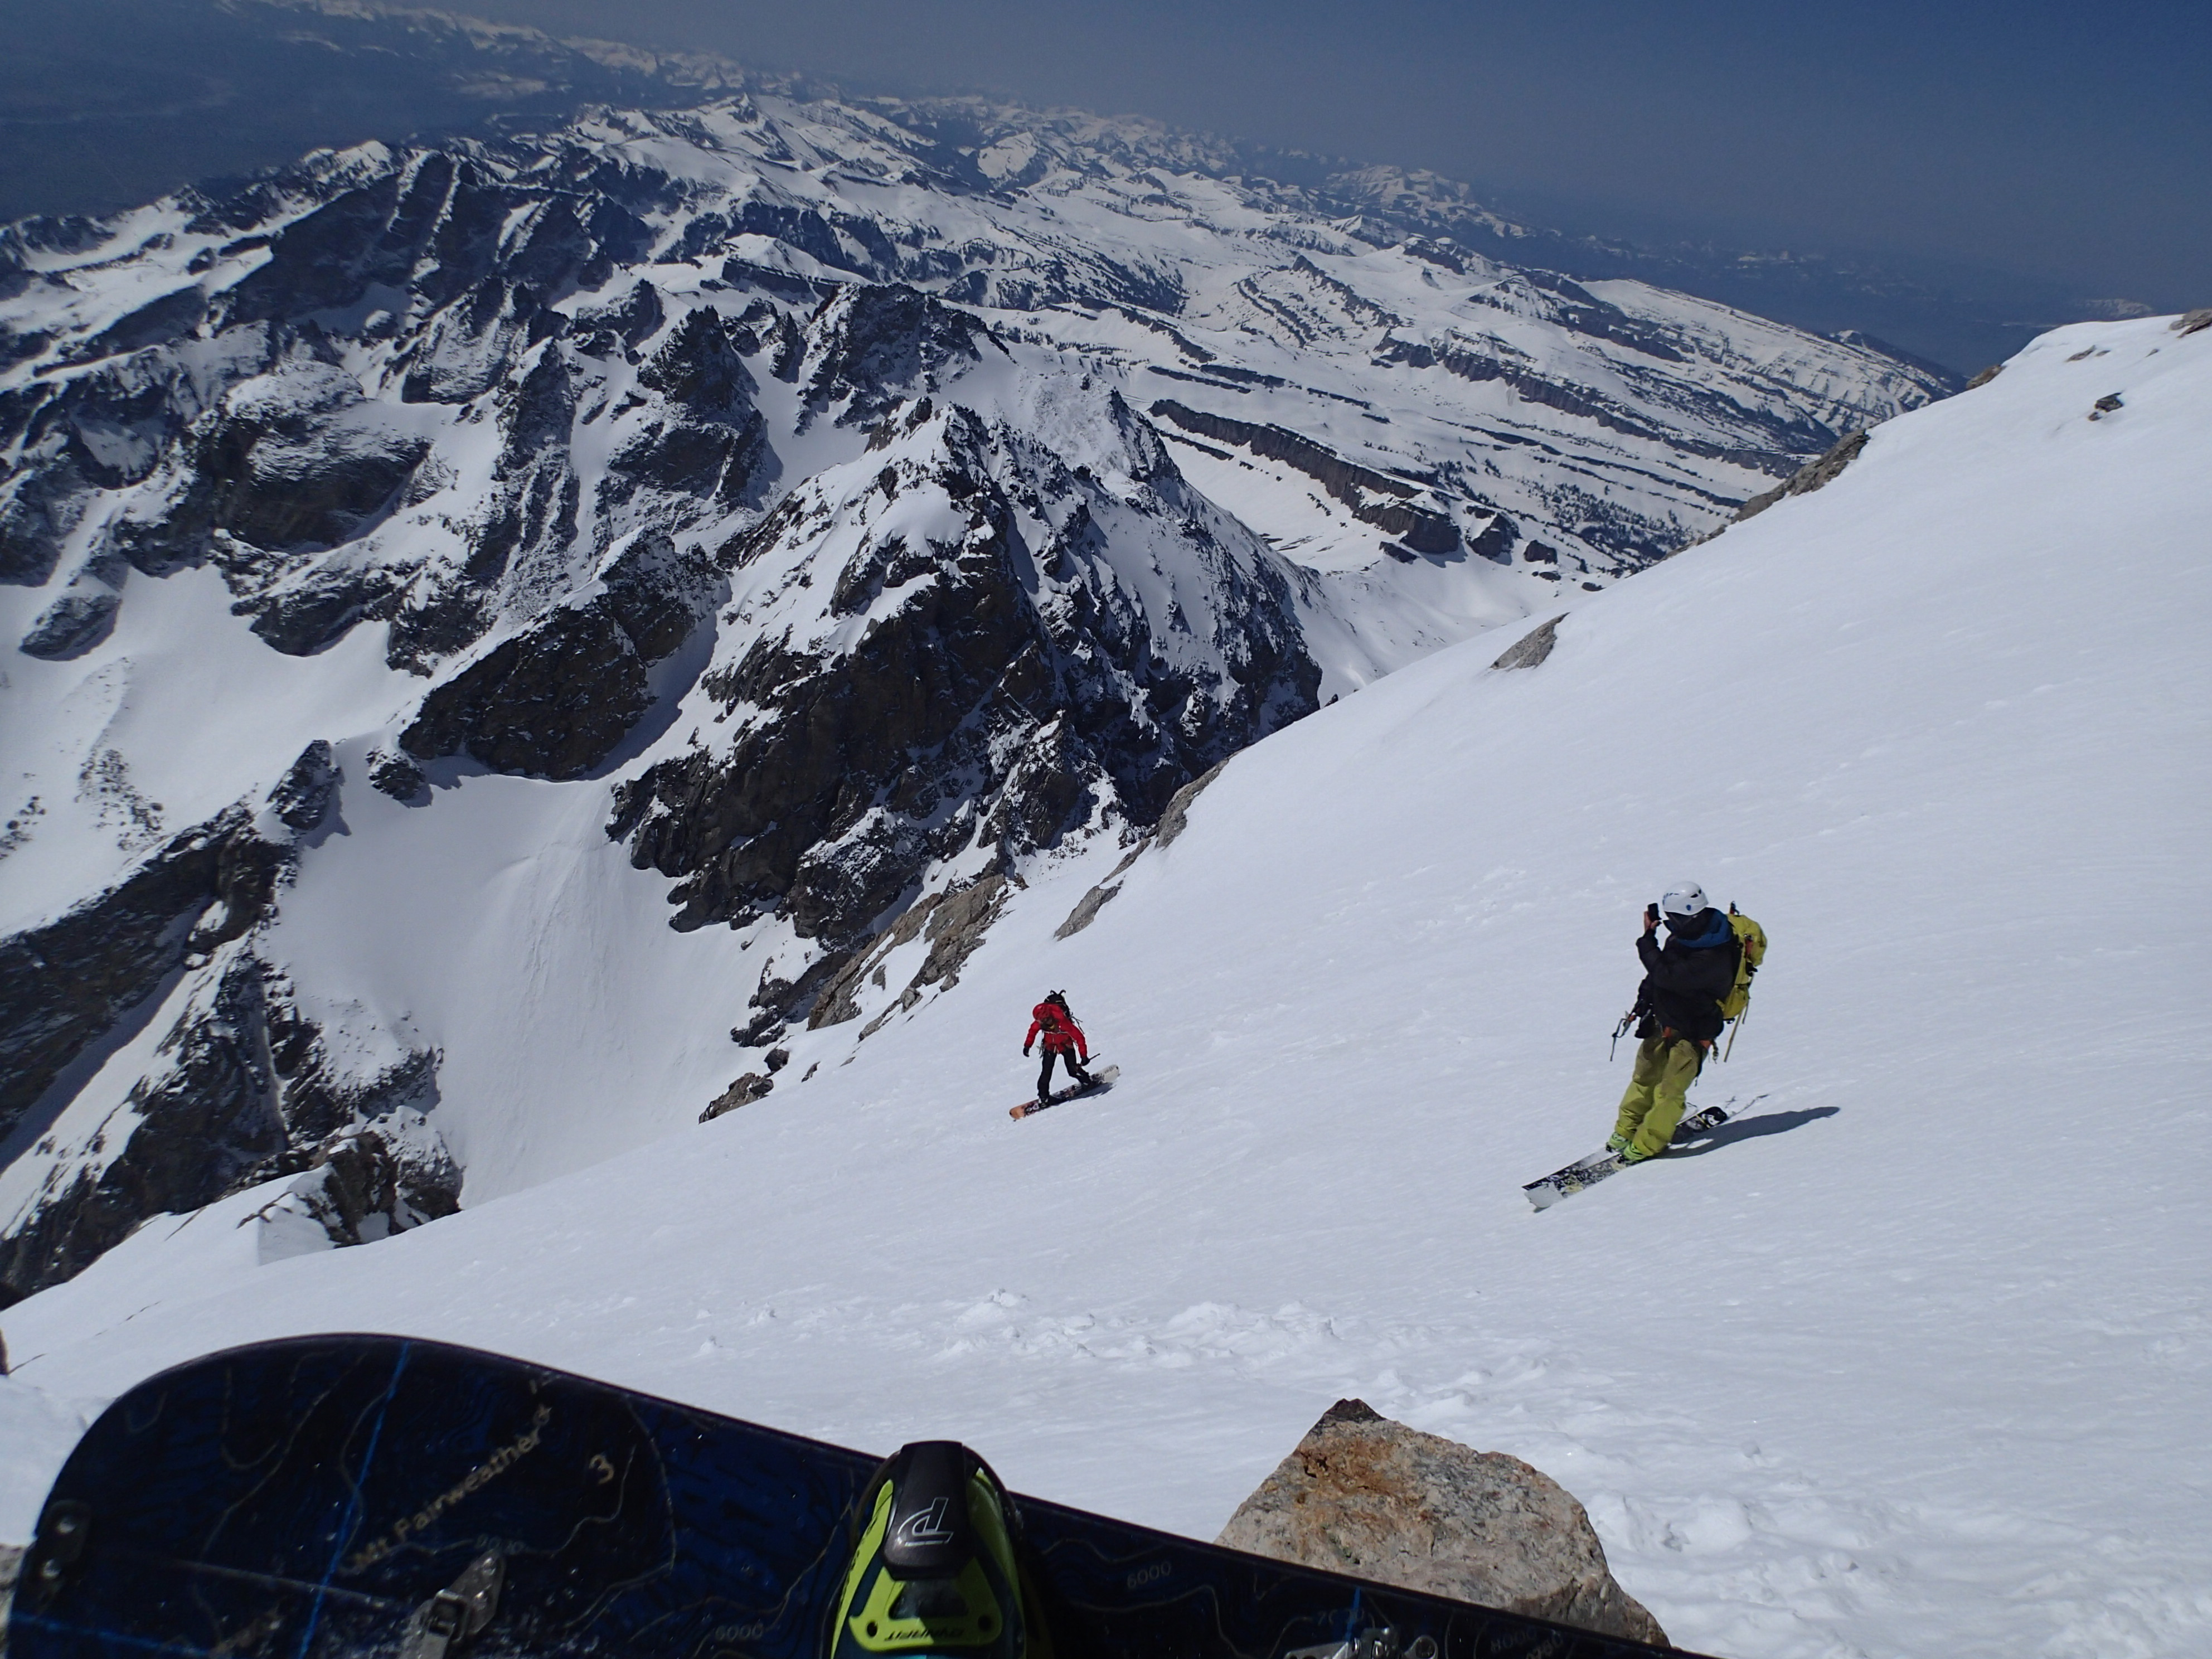 Snowboarding down the Grand Teton